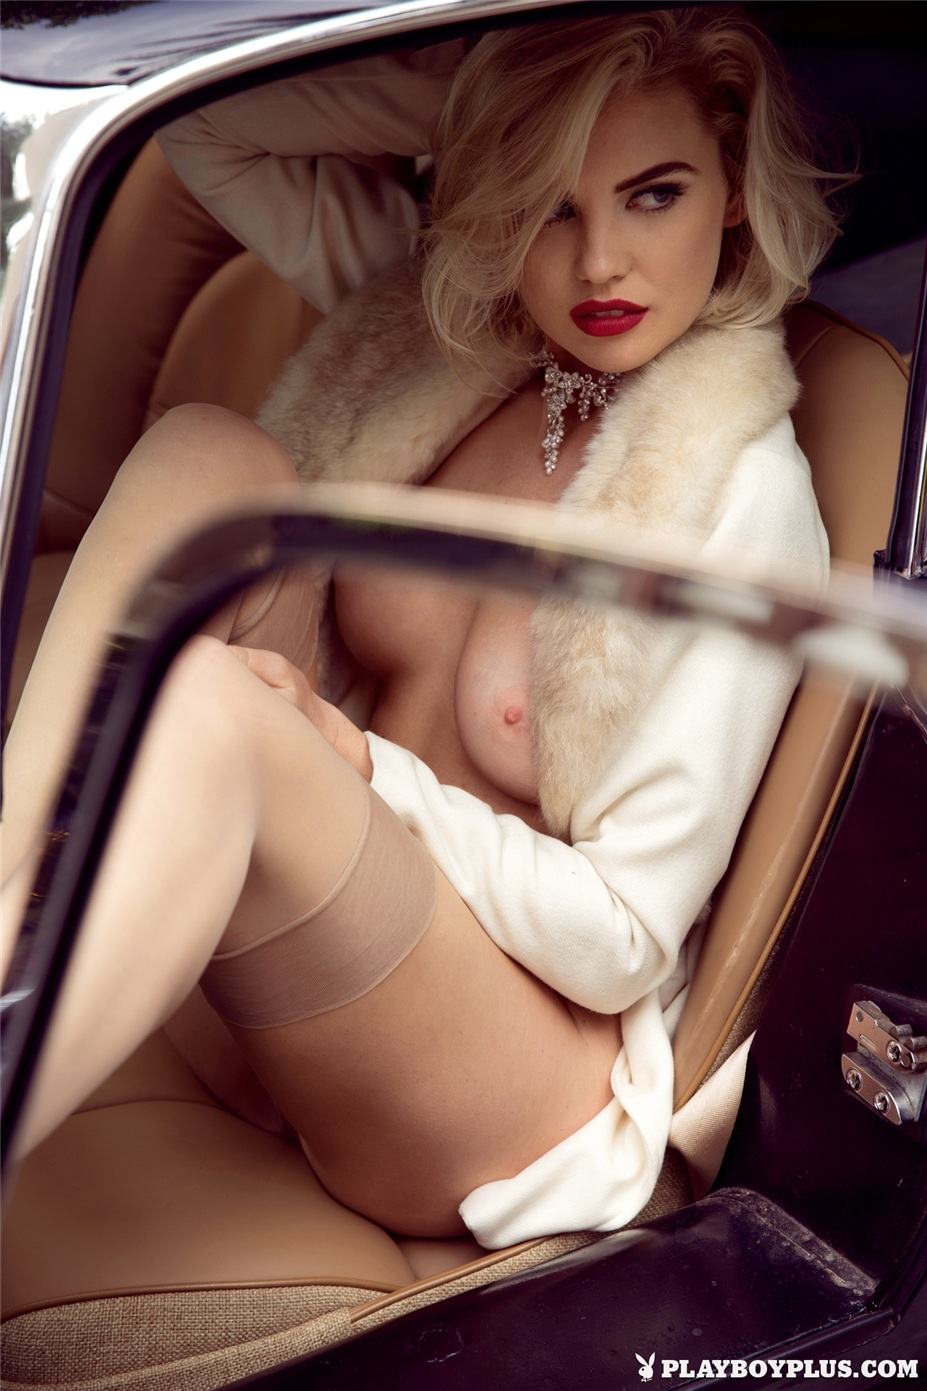 Девушка месяца Кейсли Коллинс / Kayslee Collins - Playboy USA Miss February 2015